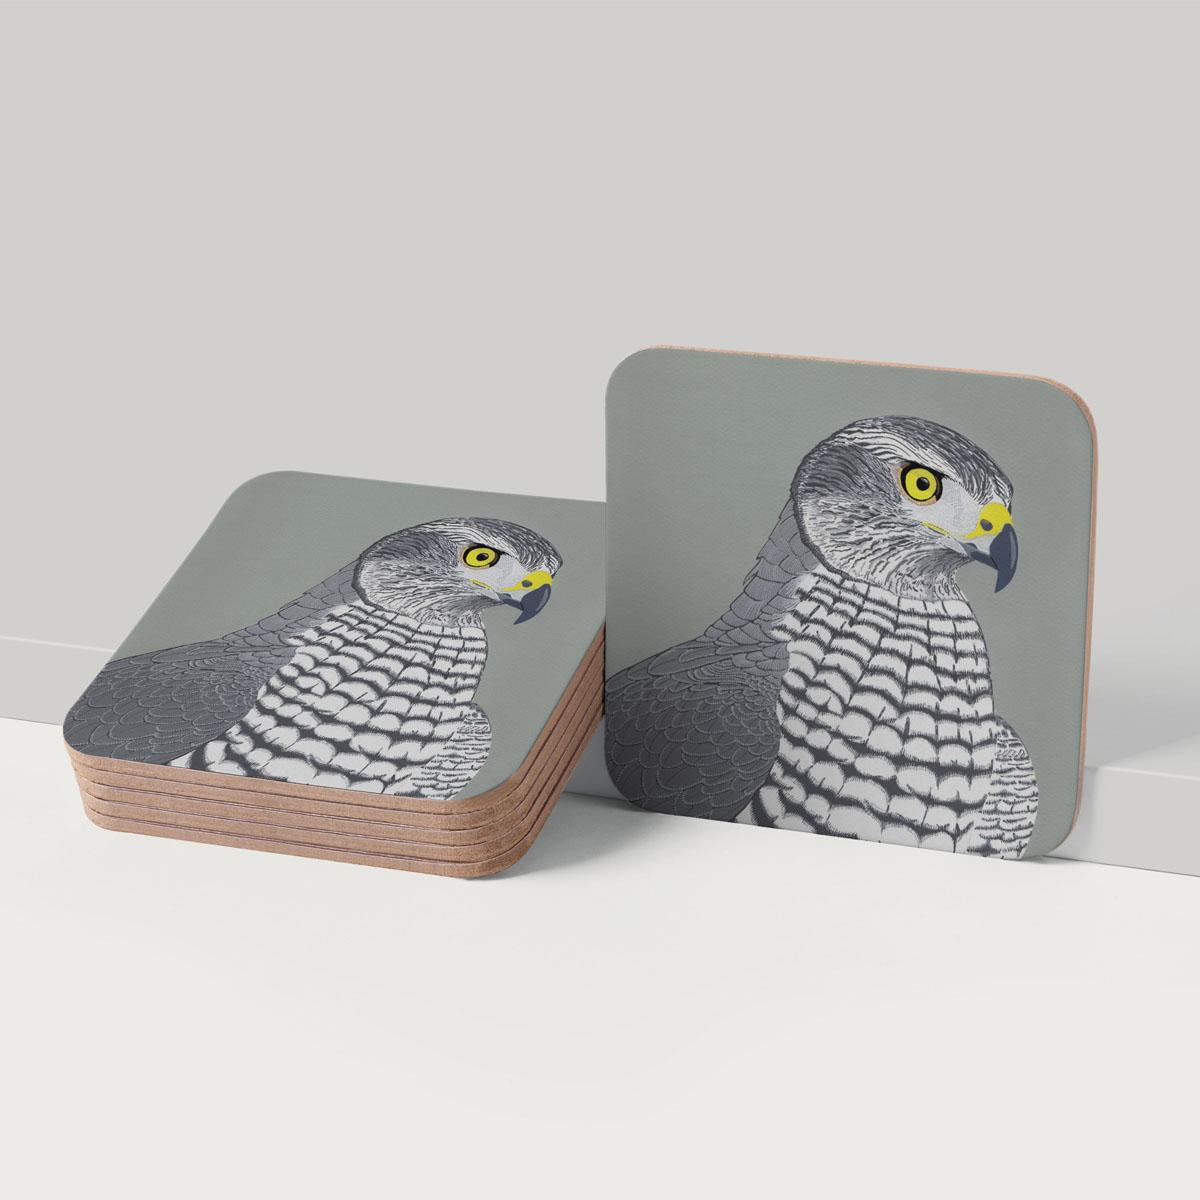 Goshawk Placemat Coaster Homewares